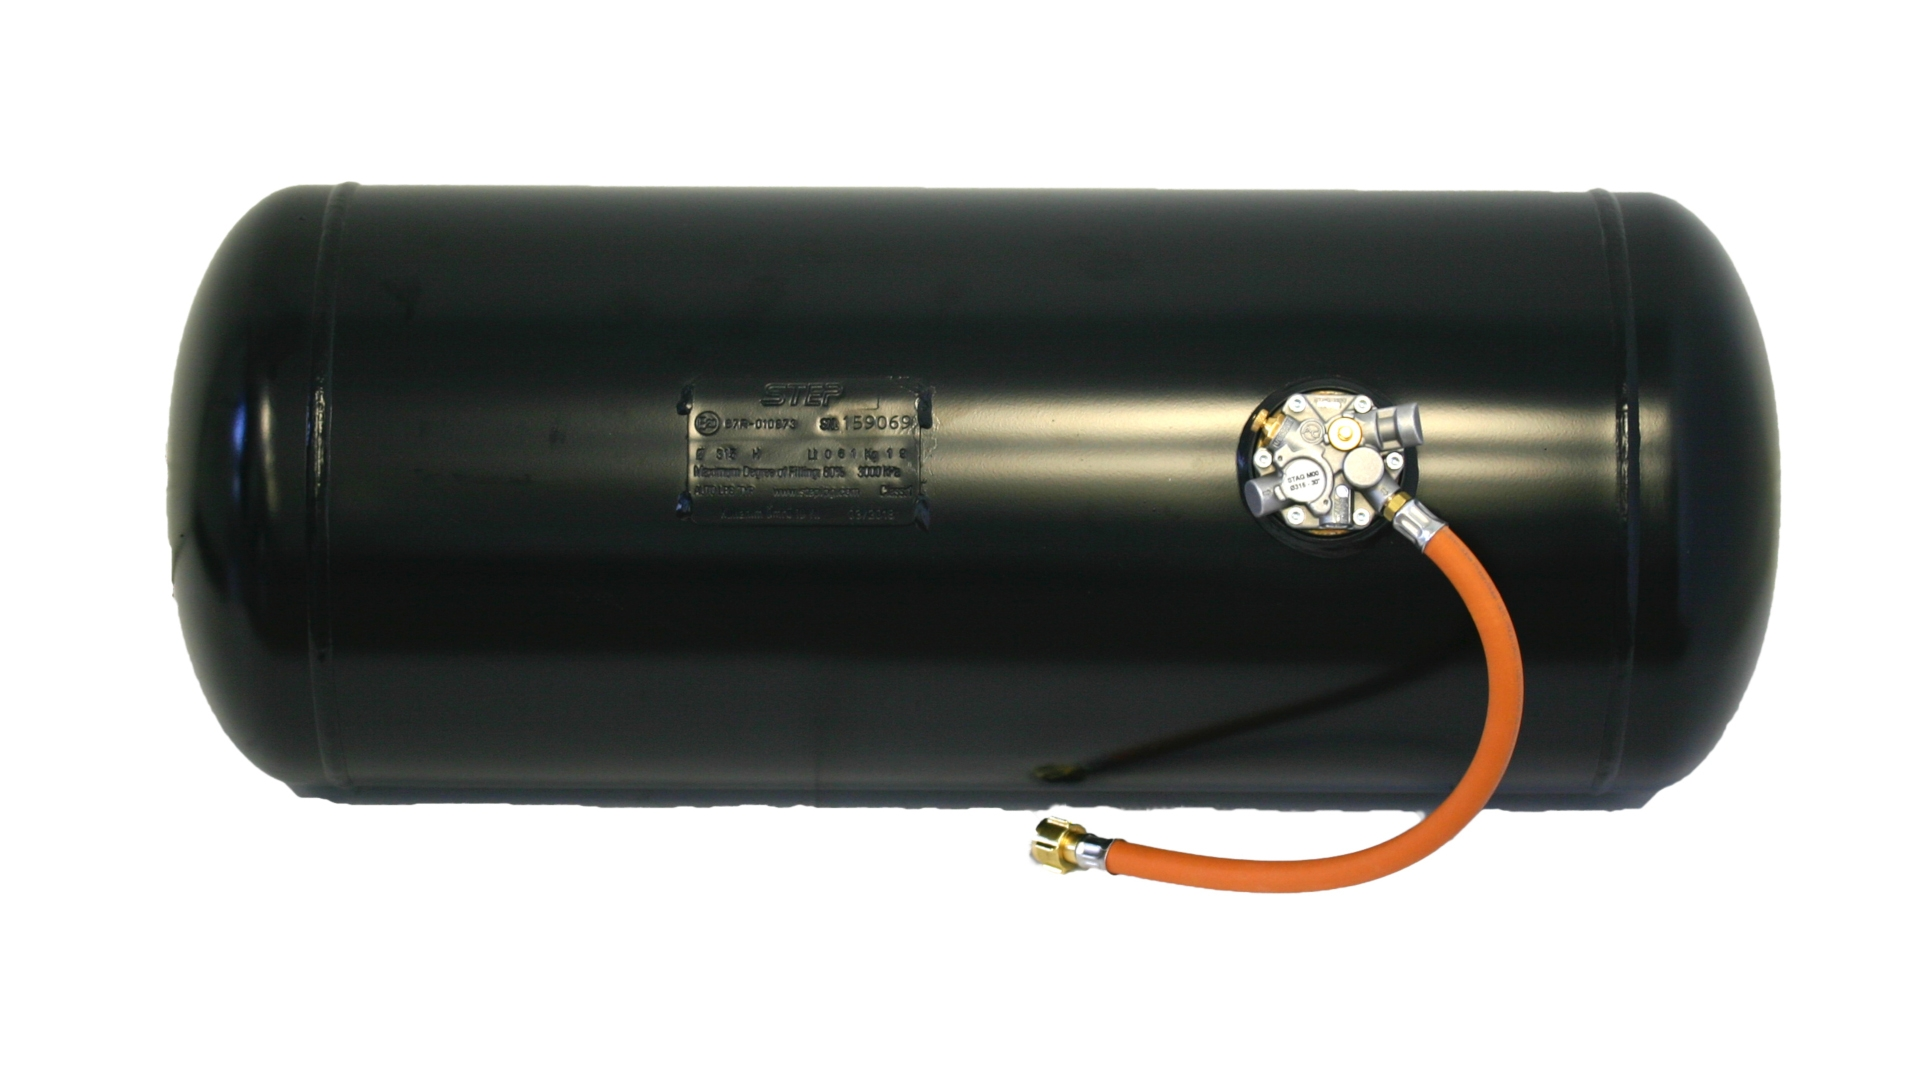 Multiventil-Brenngas-Zylindertank (1920x1080)